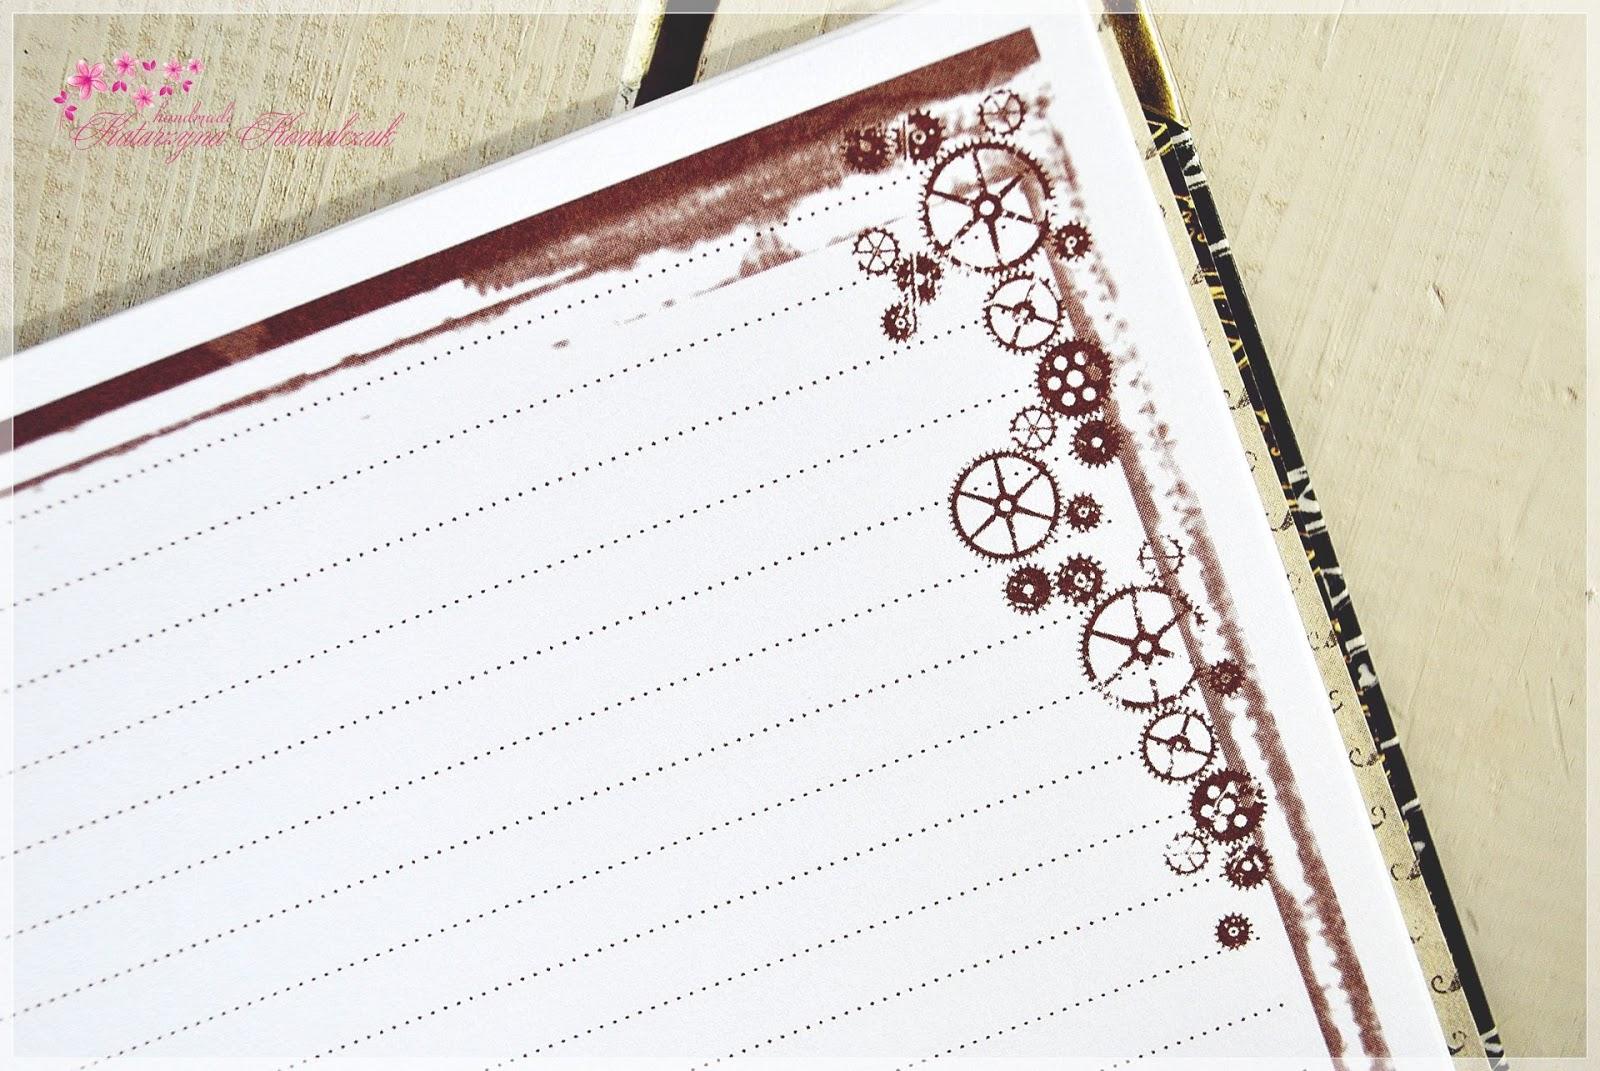 notatnik pamiętnik scrapbooking